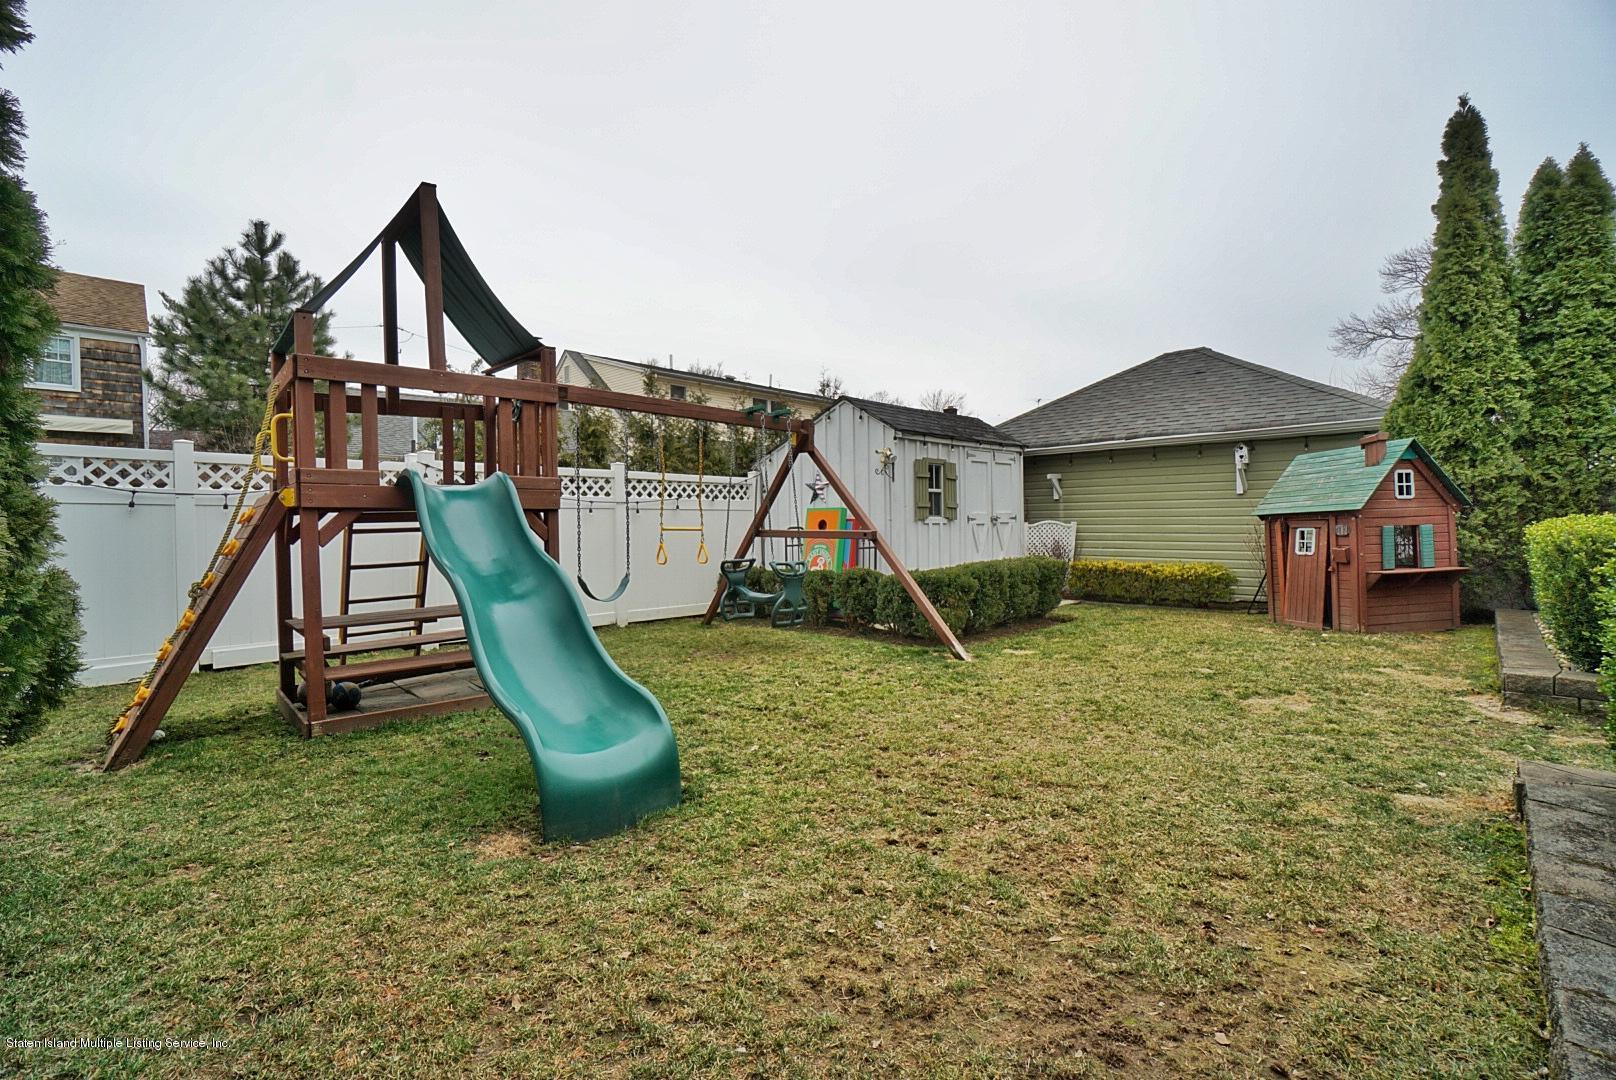 Single Family - Detached 171 Keiber Court  Staten Island, NY 10314, MLS-1127425-47